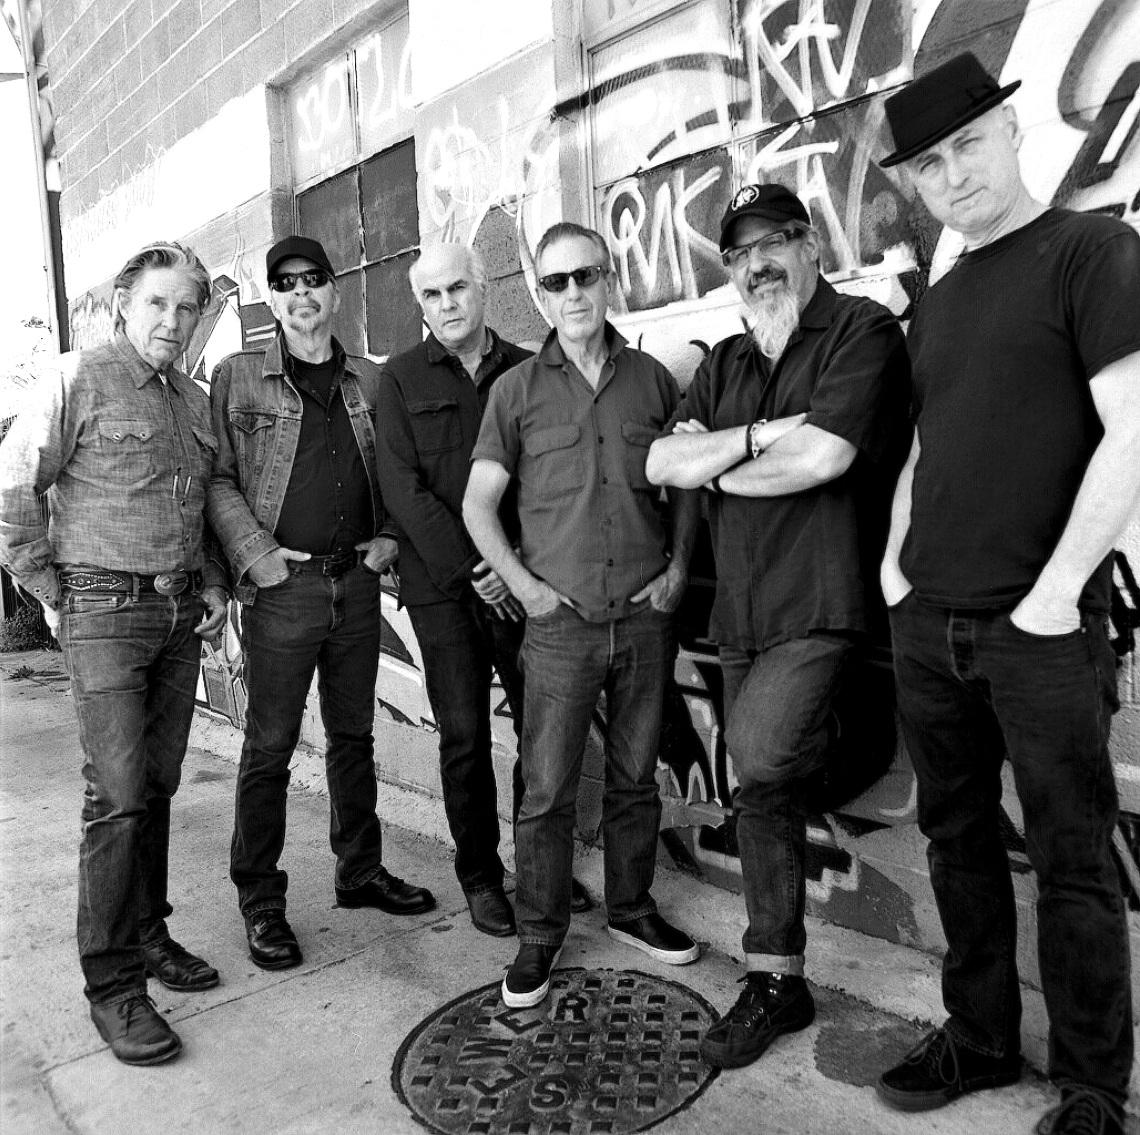 FleshEatersgood-band-foto-c Photo credit Frank Lee Drennen